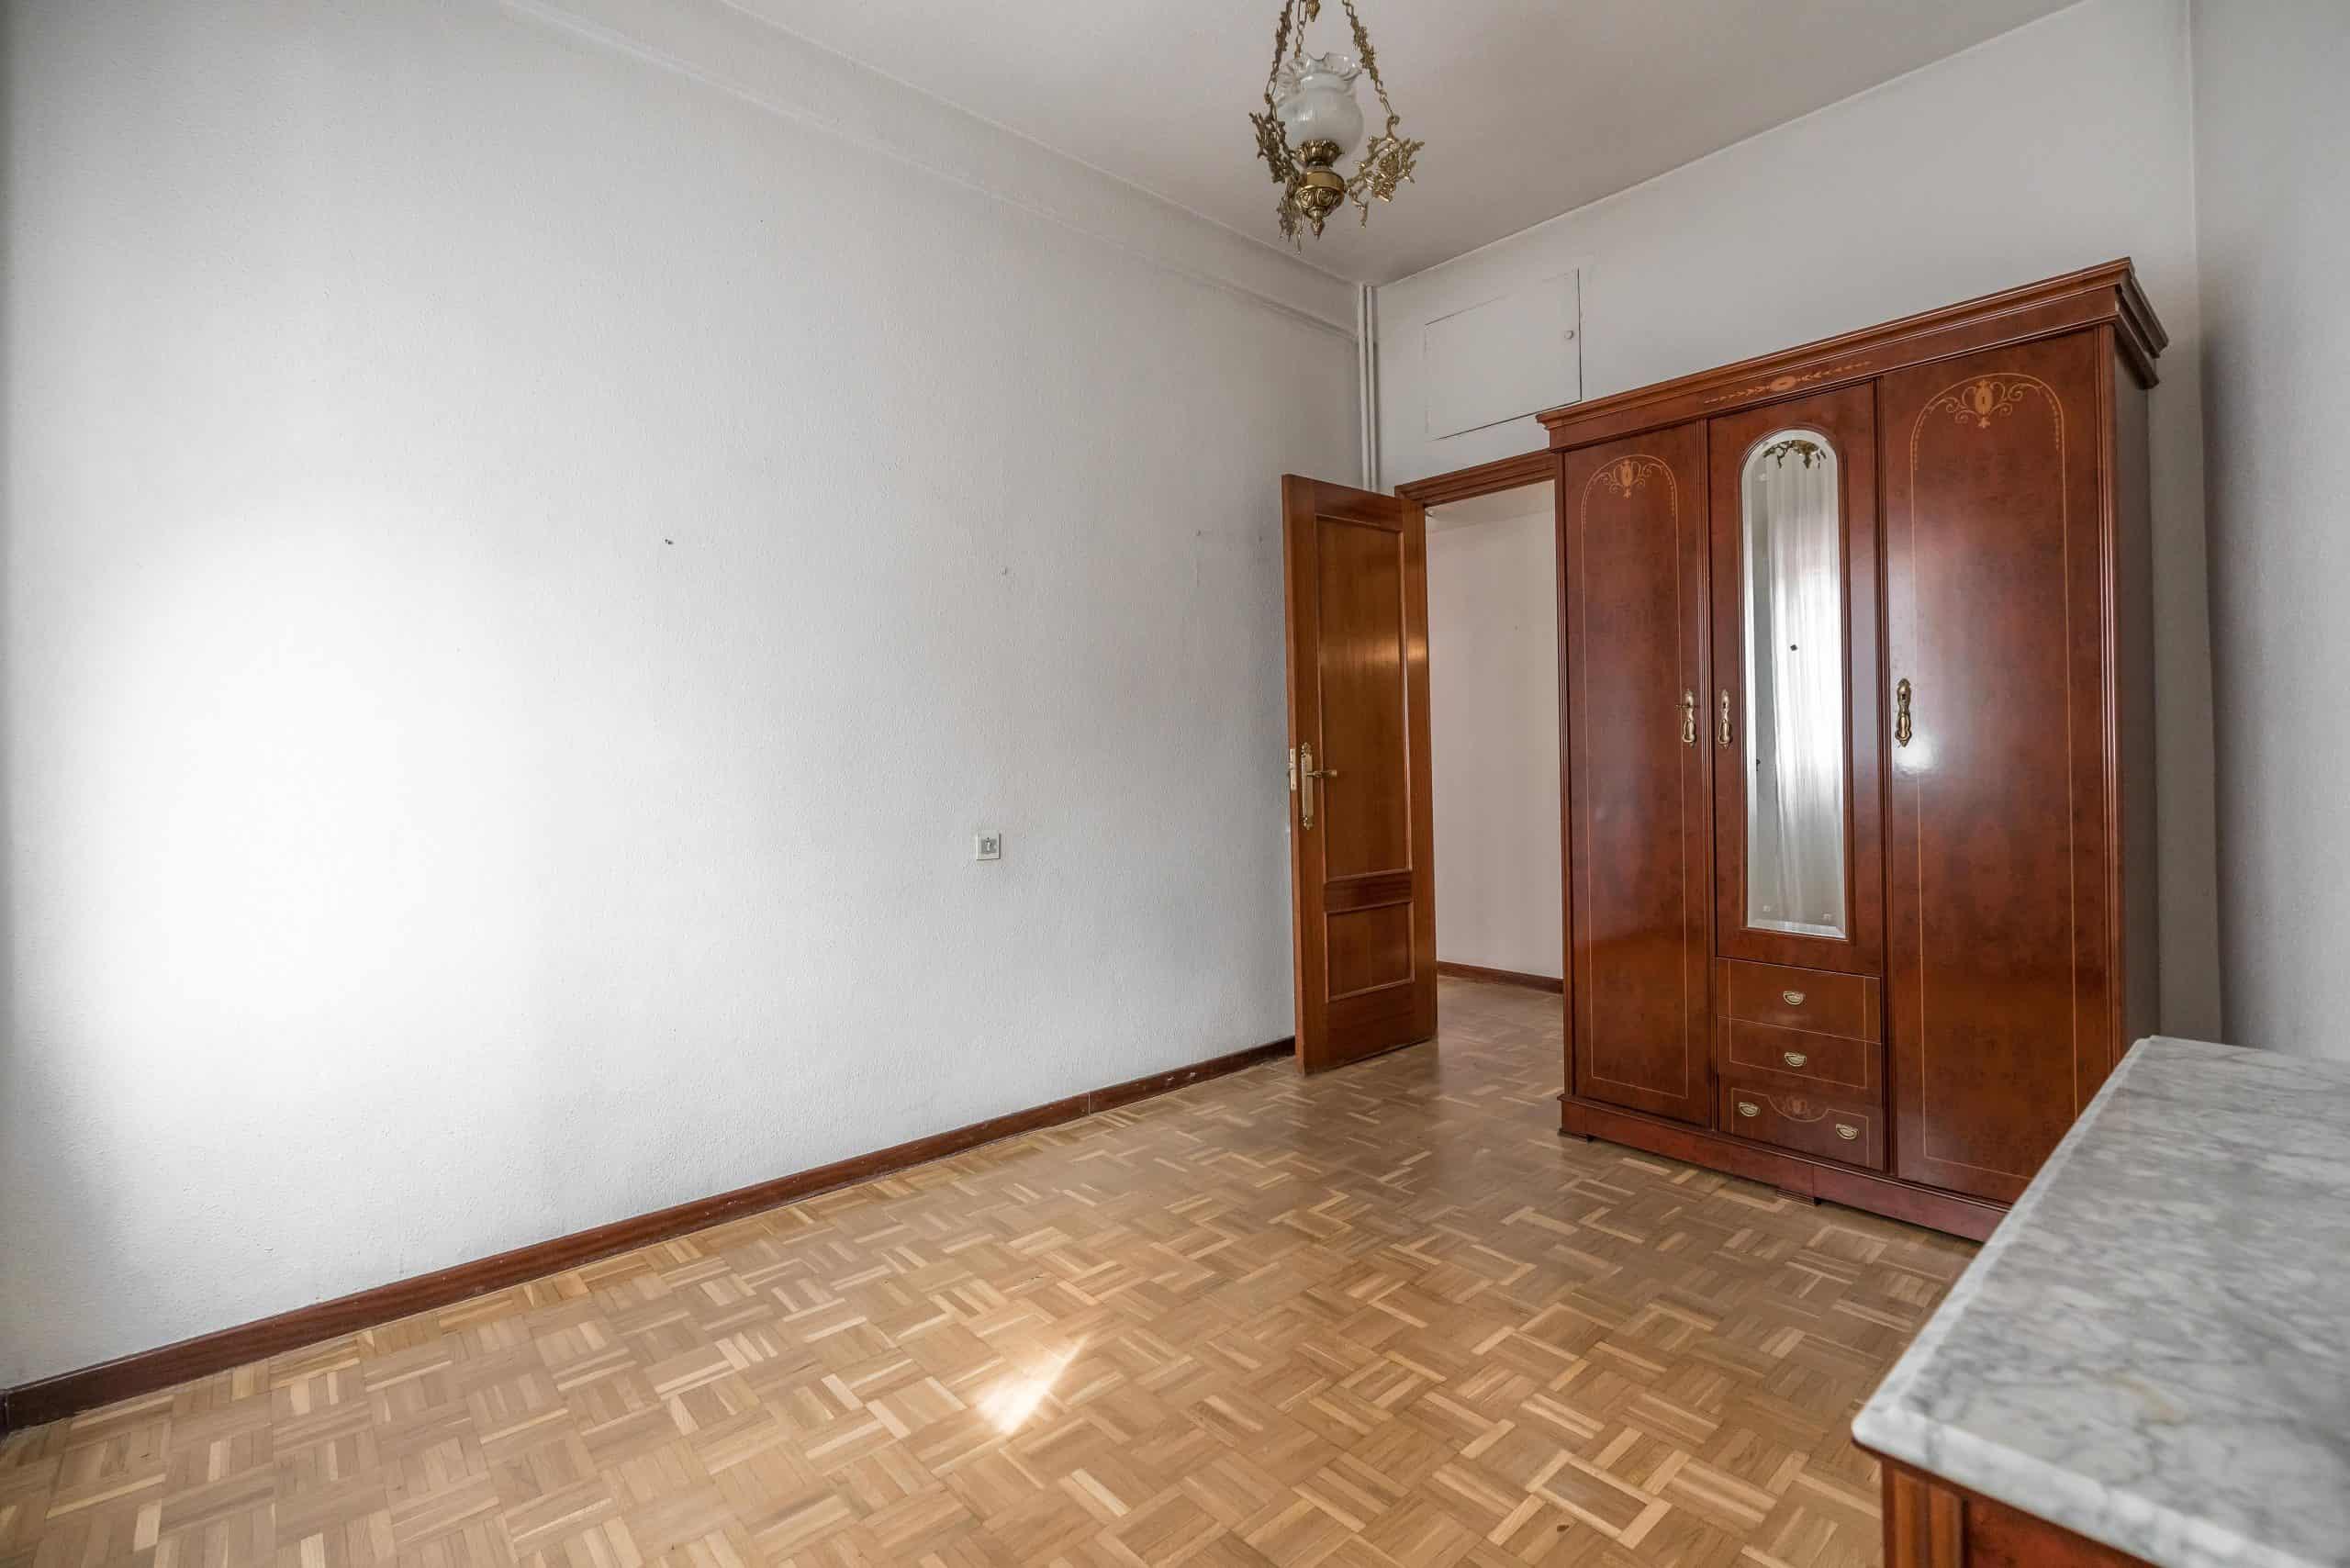 Agencia Inmobiliaria de Madrid-FUTUROCASA-Zona ARGANZUELA-LEGAZPI -calle Jaime Conquistador 48- 1er Dormitorio 3